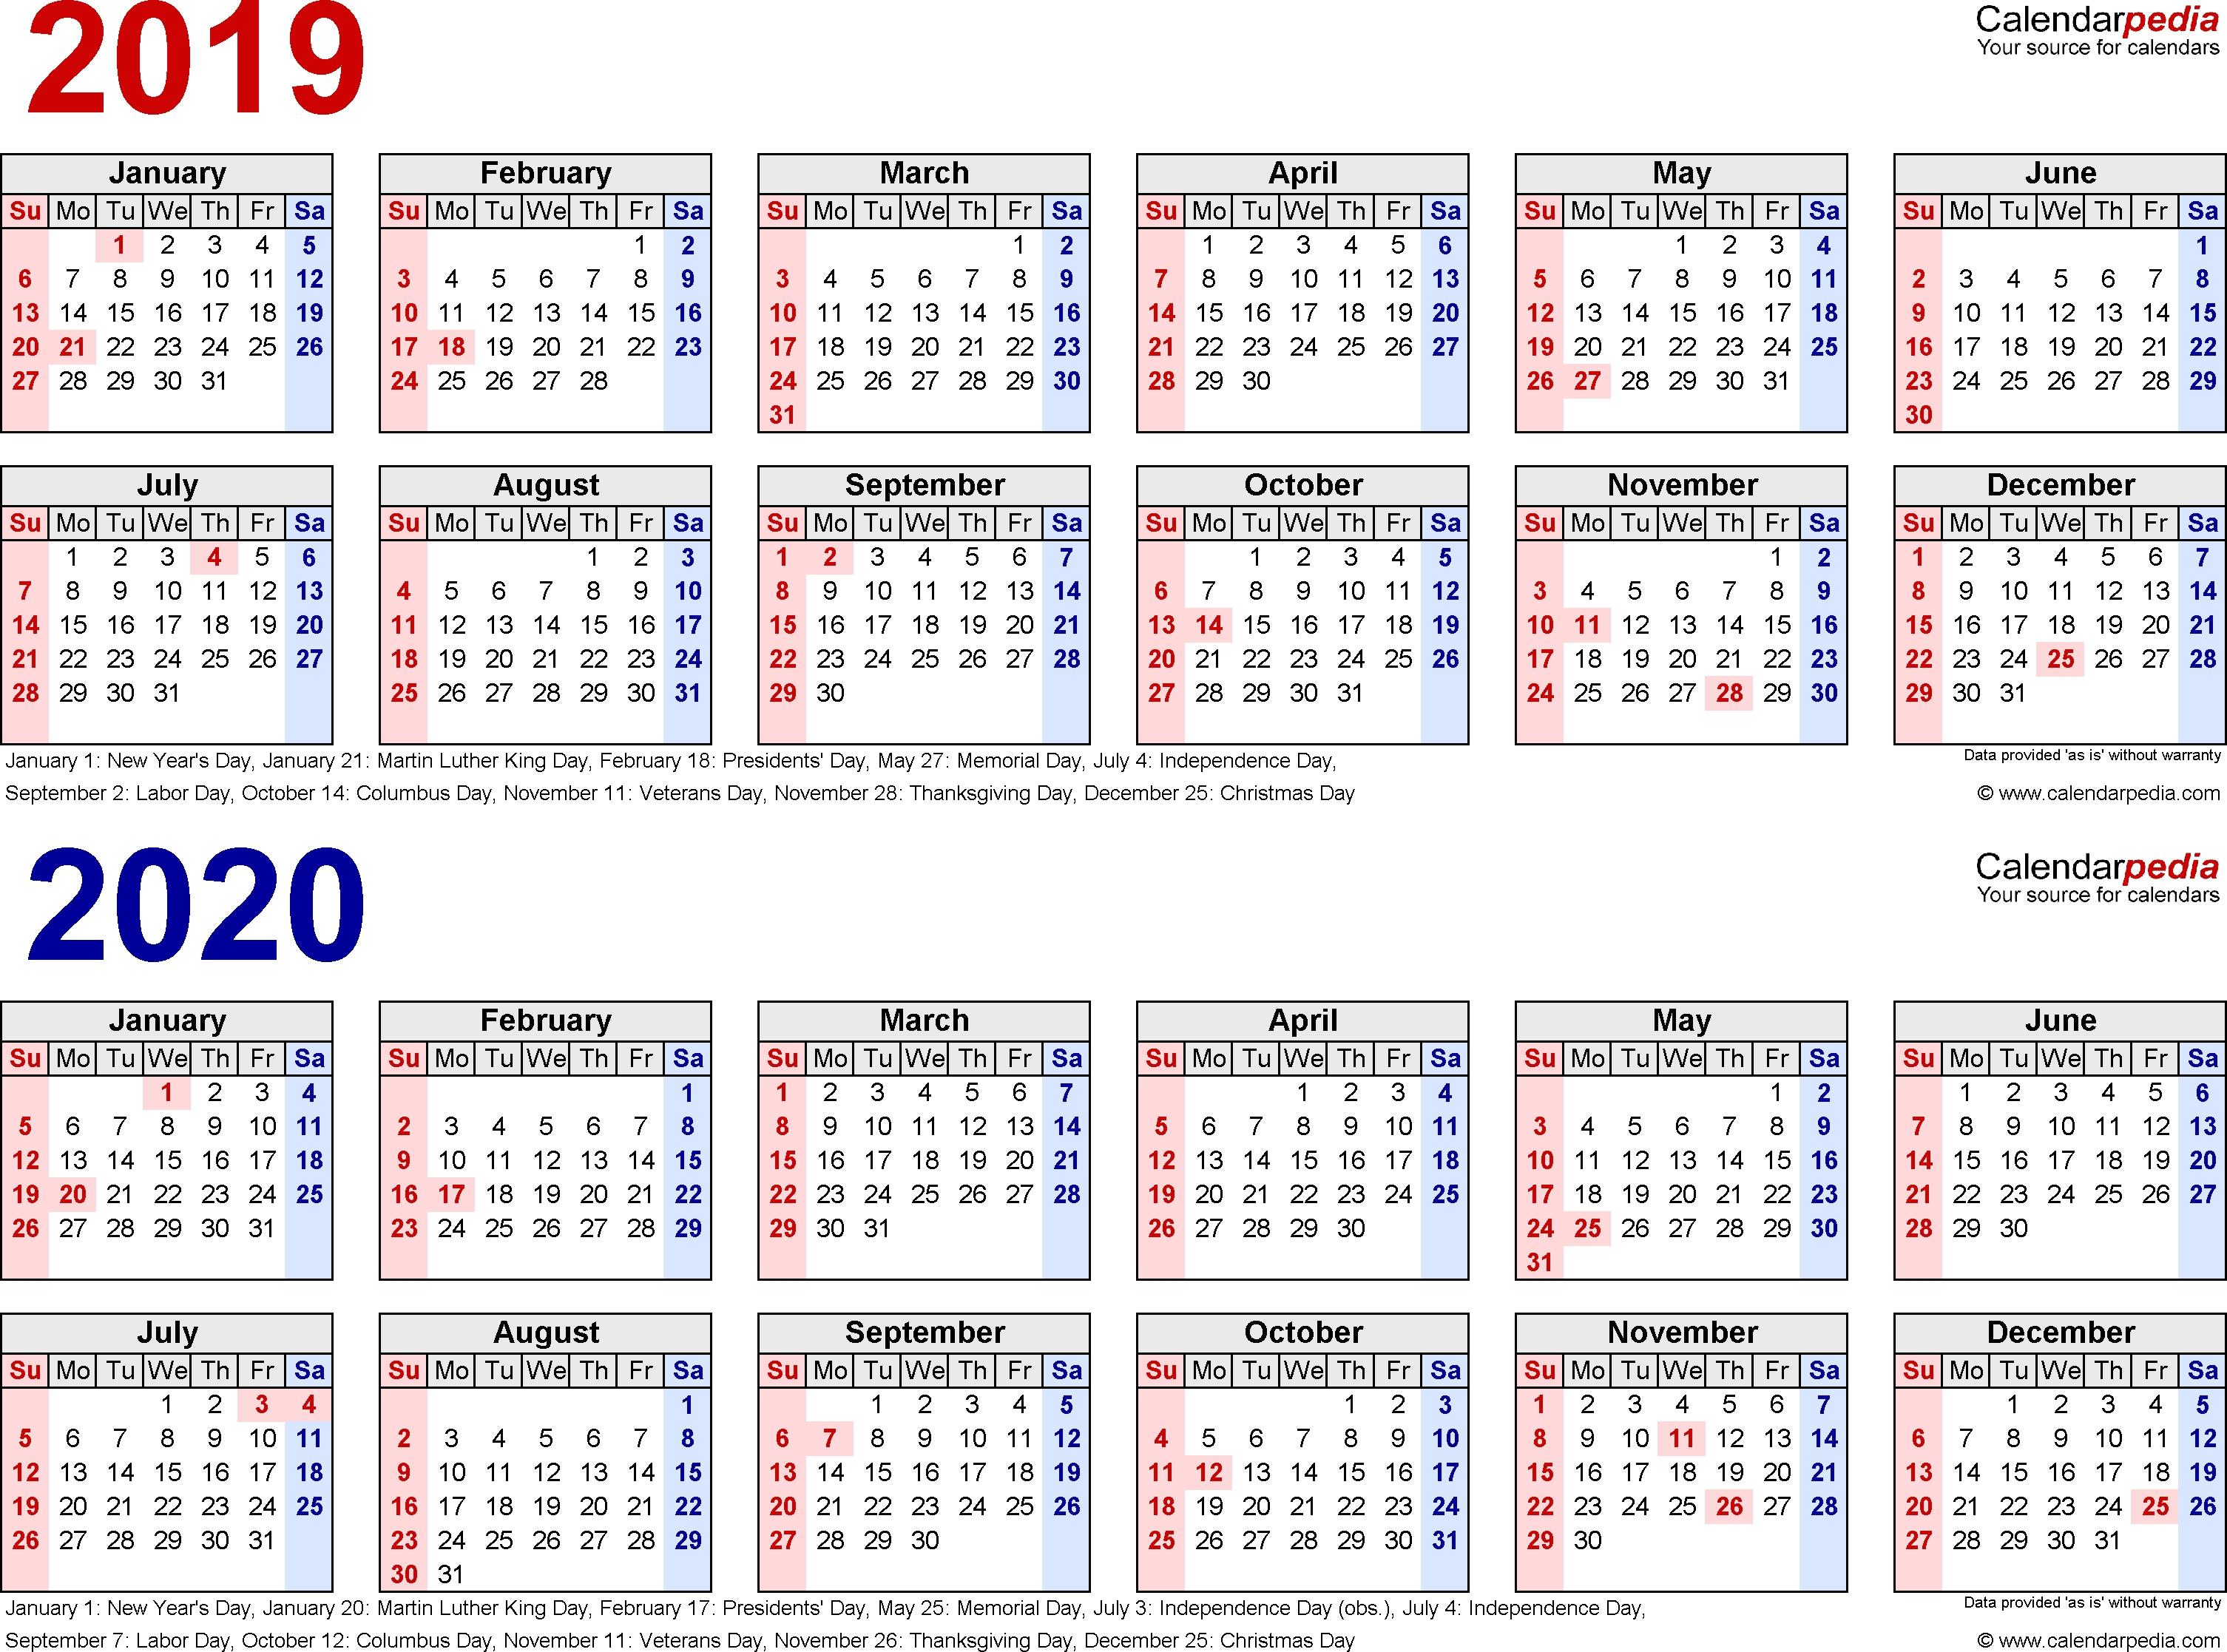 2019-2020 Calendar - Free Printable Two-Year Pdf Calendars  2020/2020 Financial Year Calendar